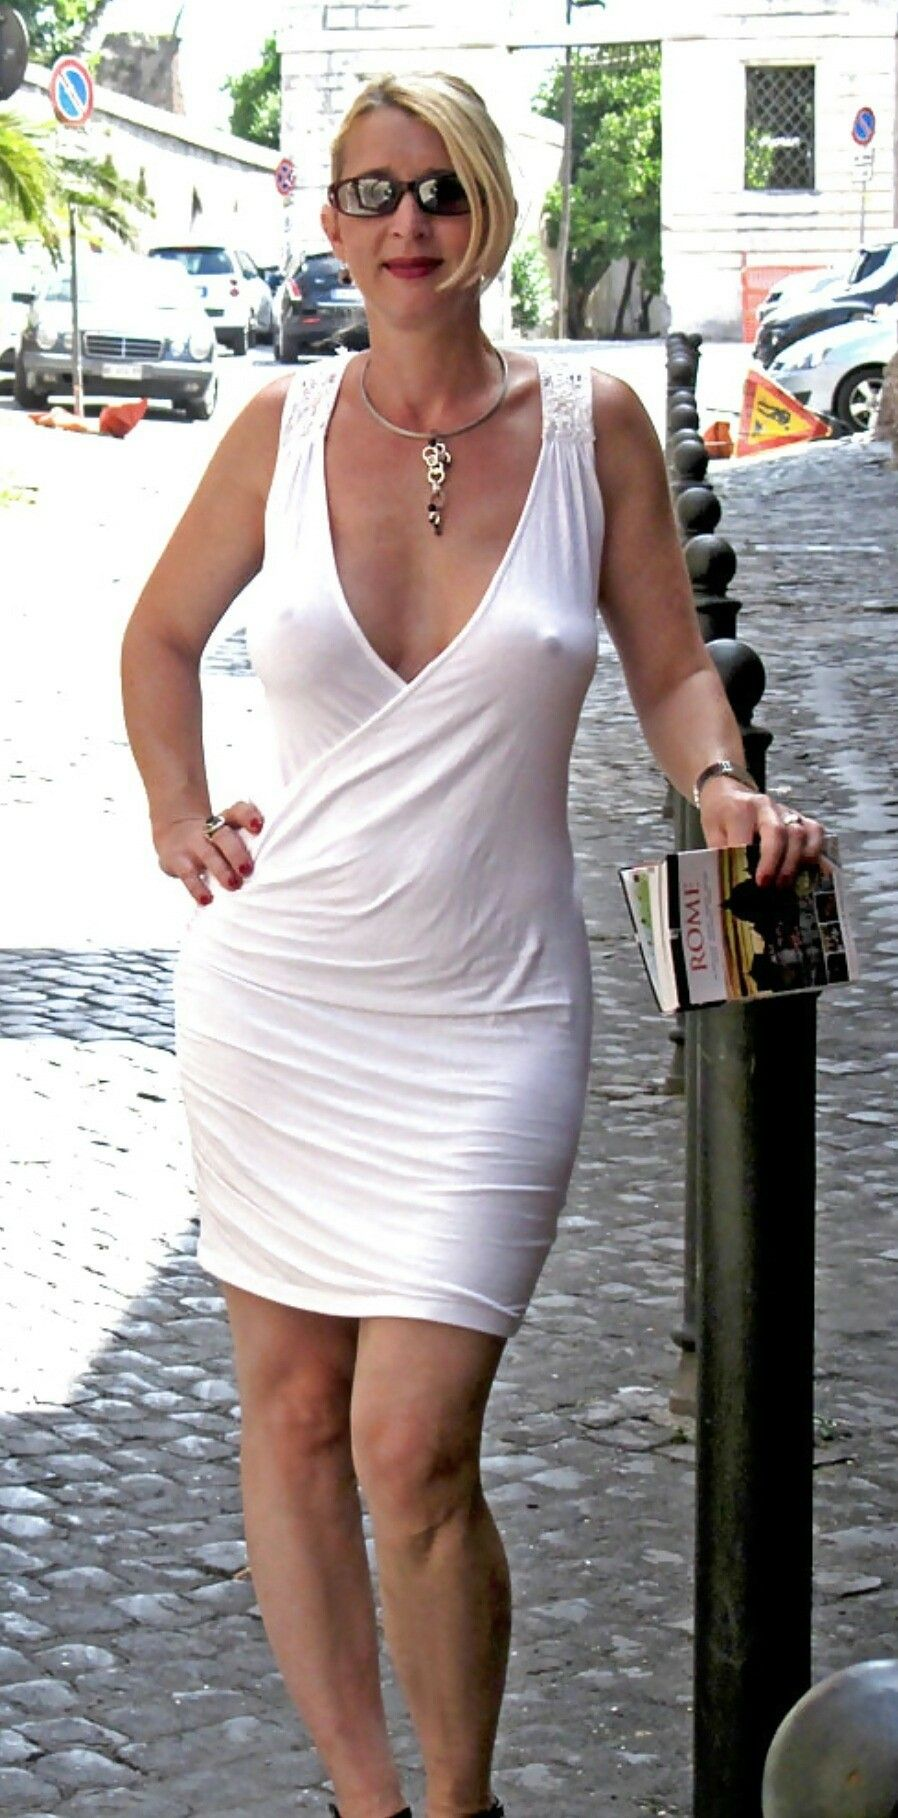 Anne mature amatuer 50